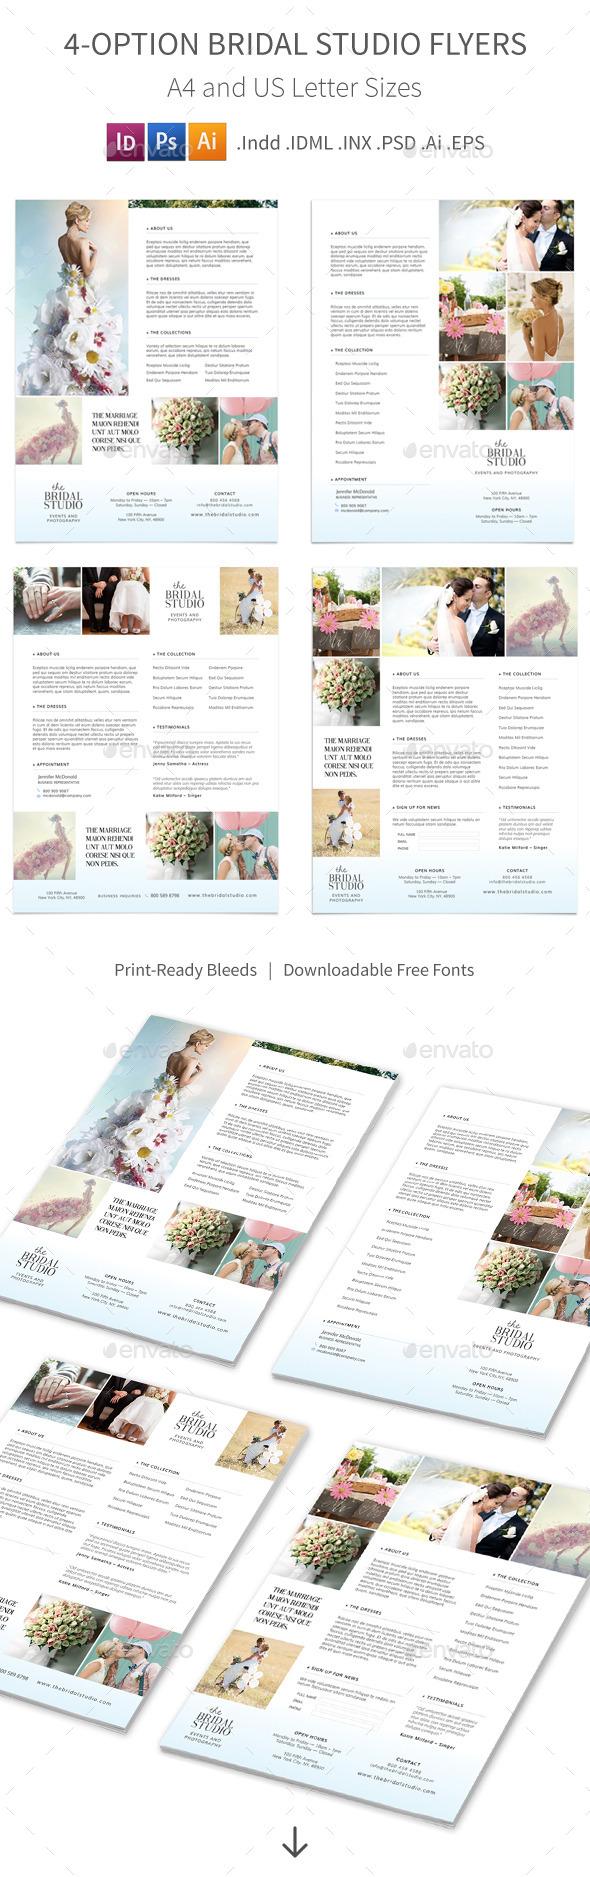 Bridal Studio Flyers – 4 Options - Corporate Flyers